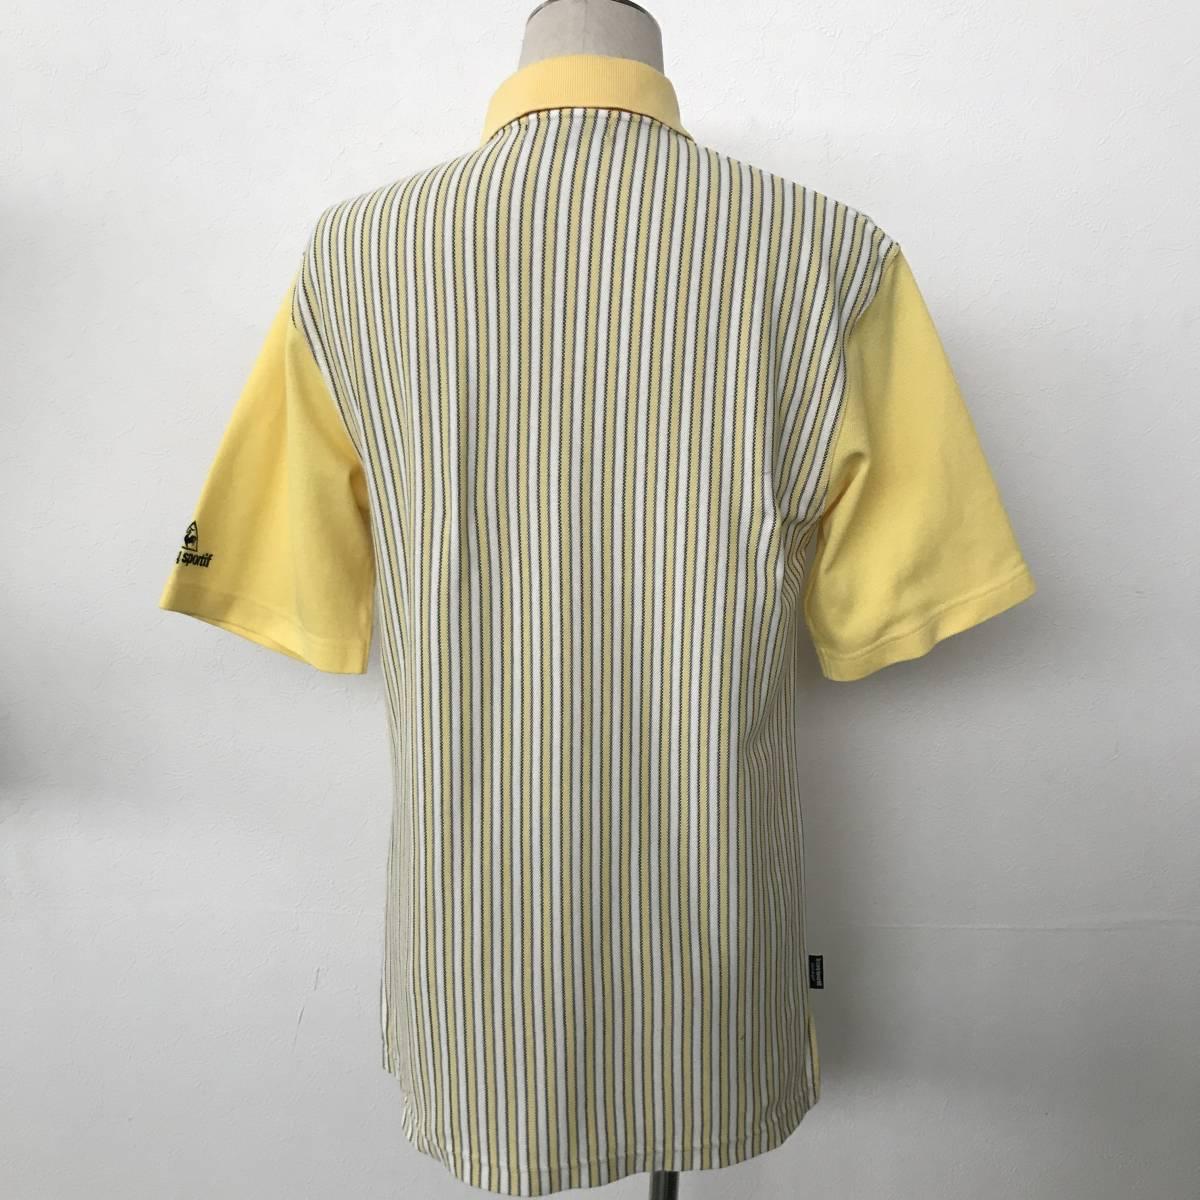 le coq sportif GOLF COLLECTION ルコック ゴルフ メンズ ストライプ柄 ロゴ刺繍入り 半袖 速乾ストレッチポロシャツ 美品 size S/L_画像2